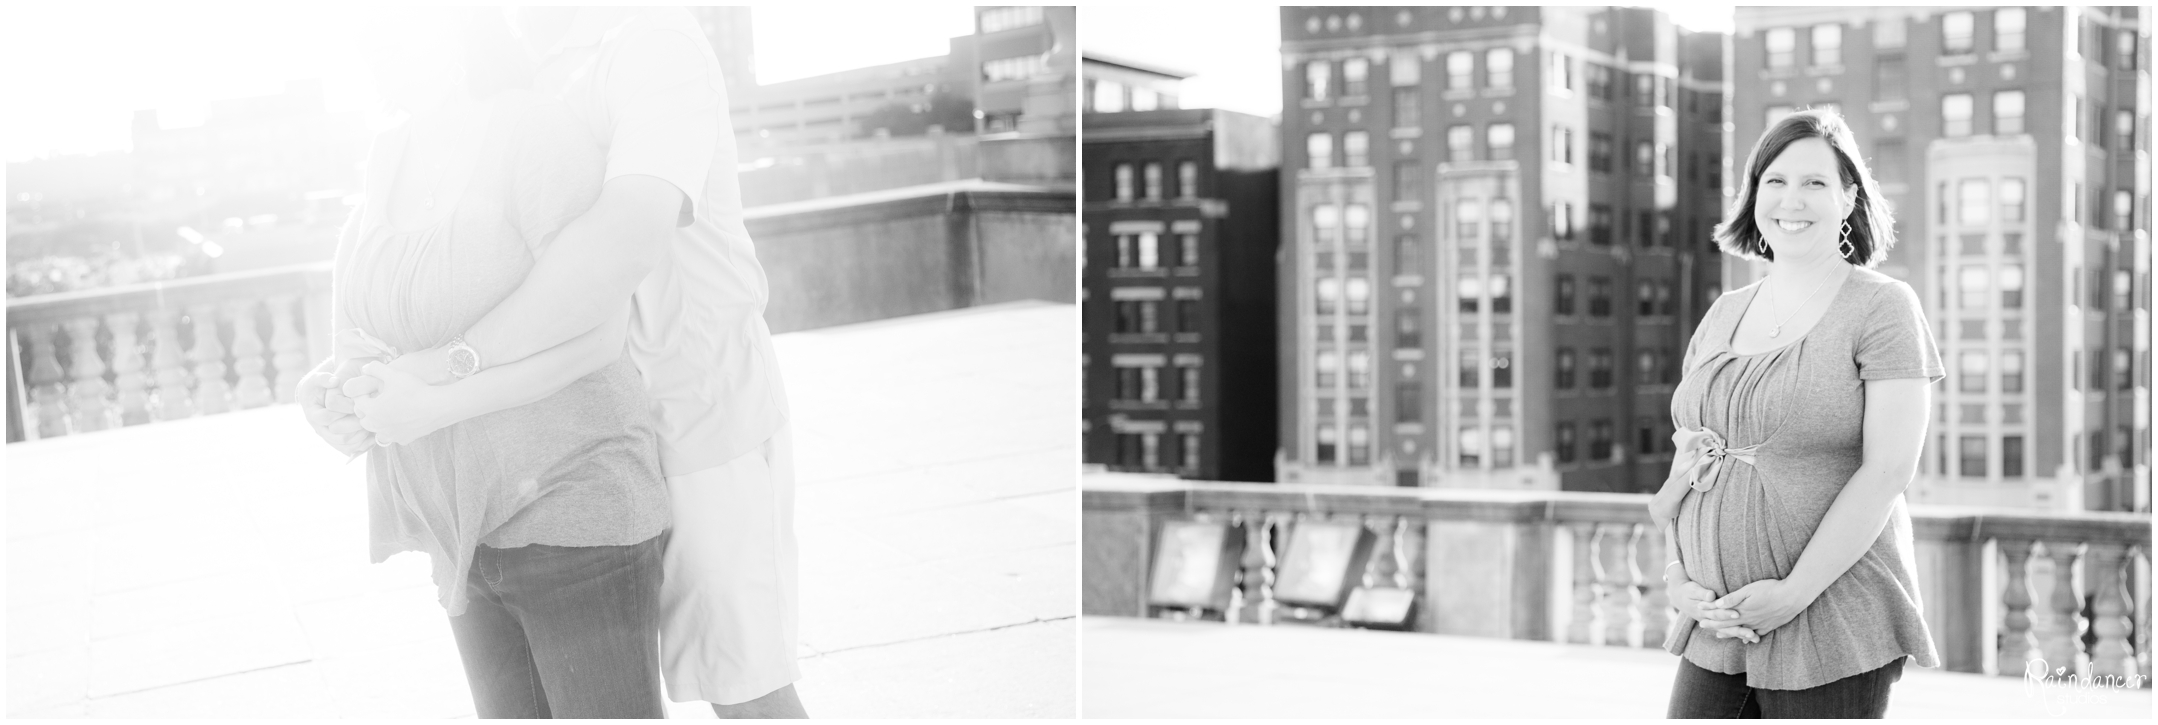 Indianapolis family photographer, Indianapolis family photography, Indy family photographer, Indy family photography, Indy children photographer, Indianapolis children photographer, Indianapolis lifestyle photographer, Indy lifestyle photographer, Indianapolis lifestyle photography, Indy lifestyle photography